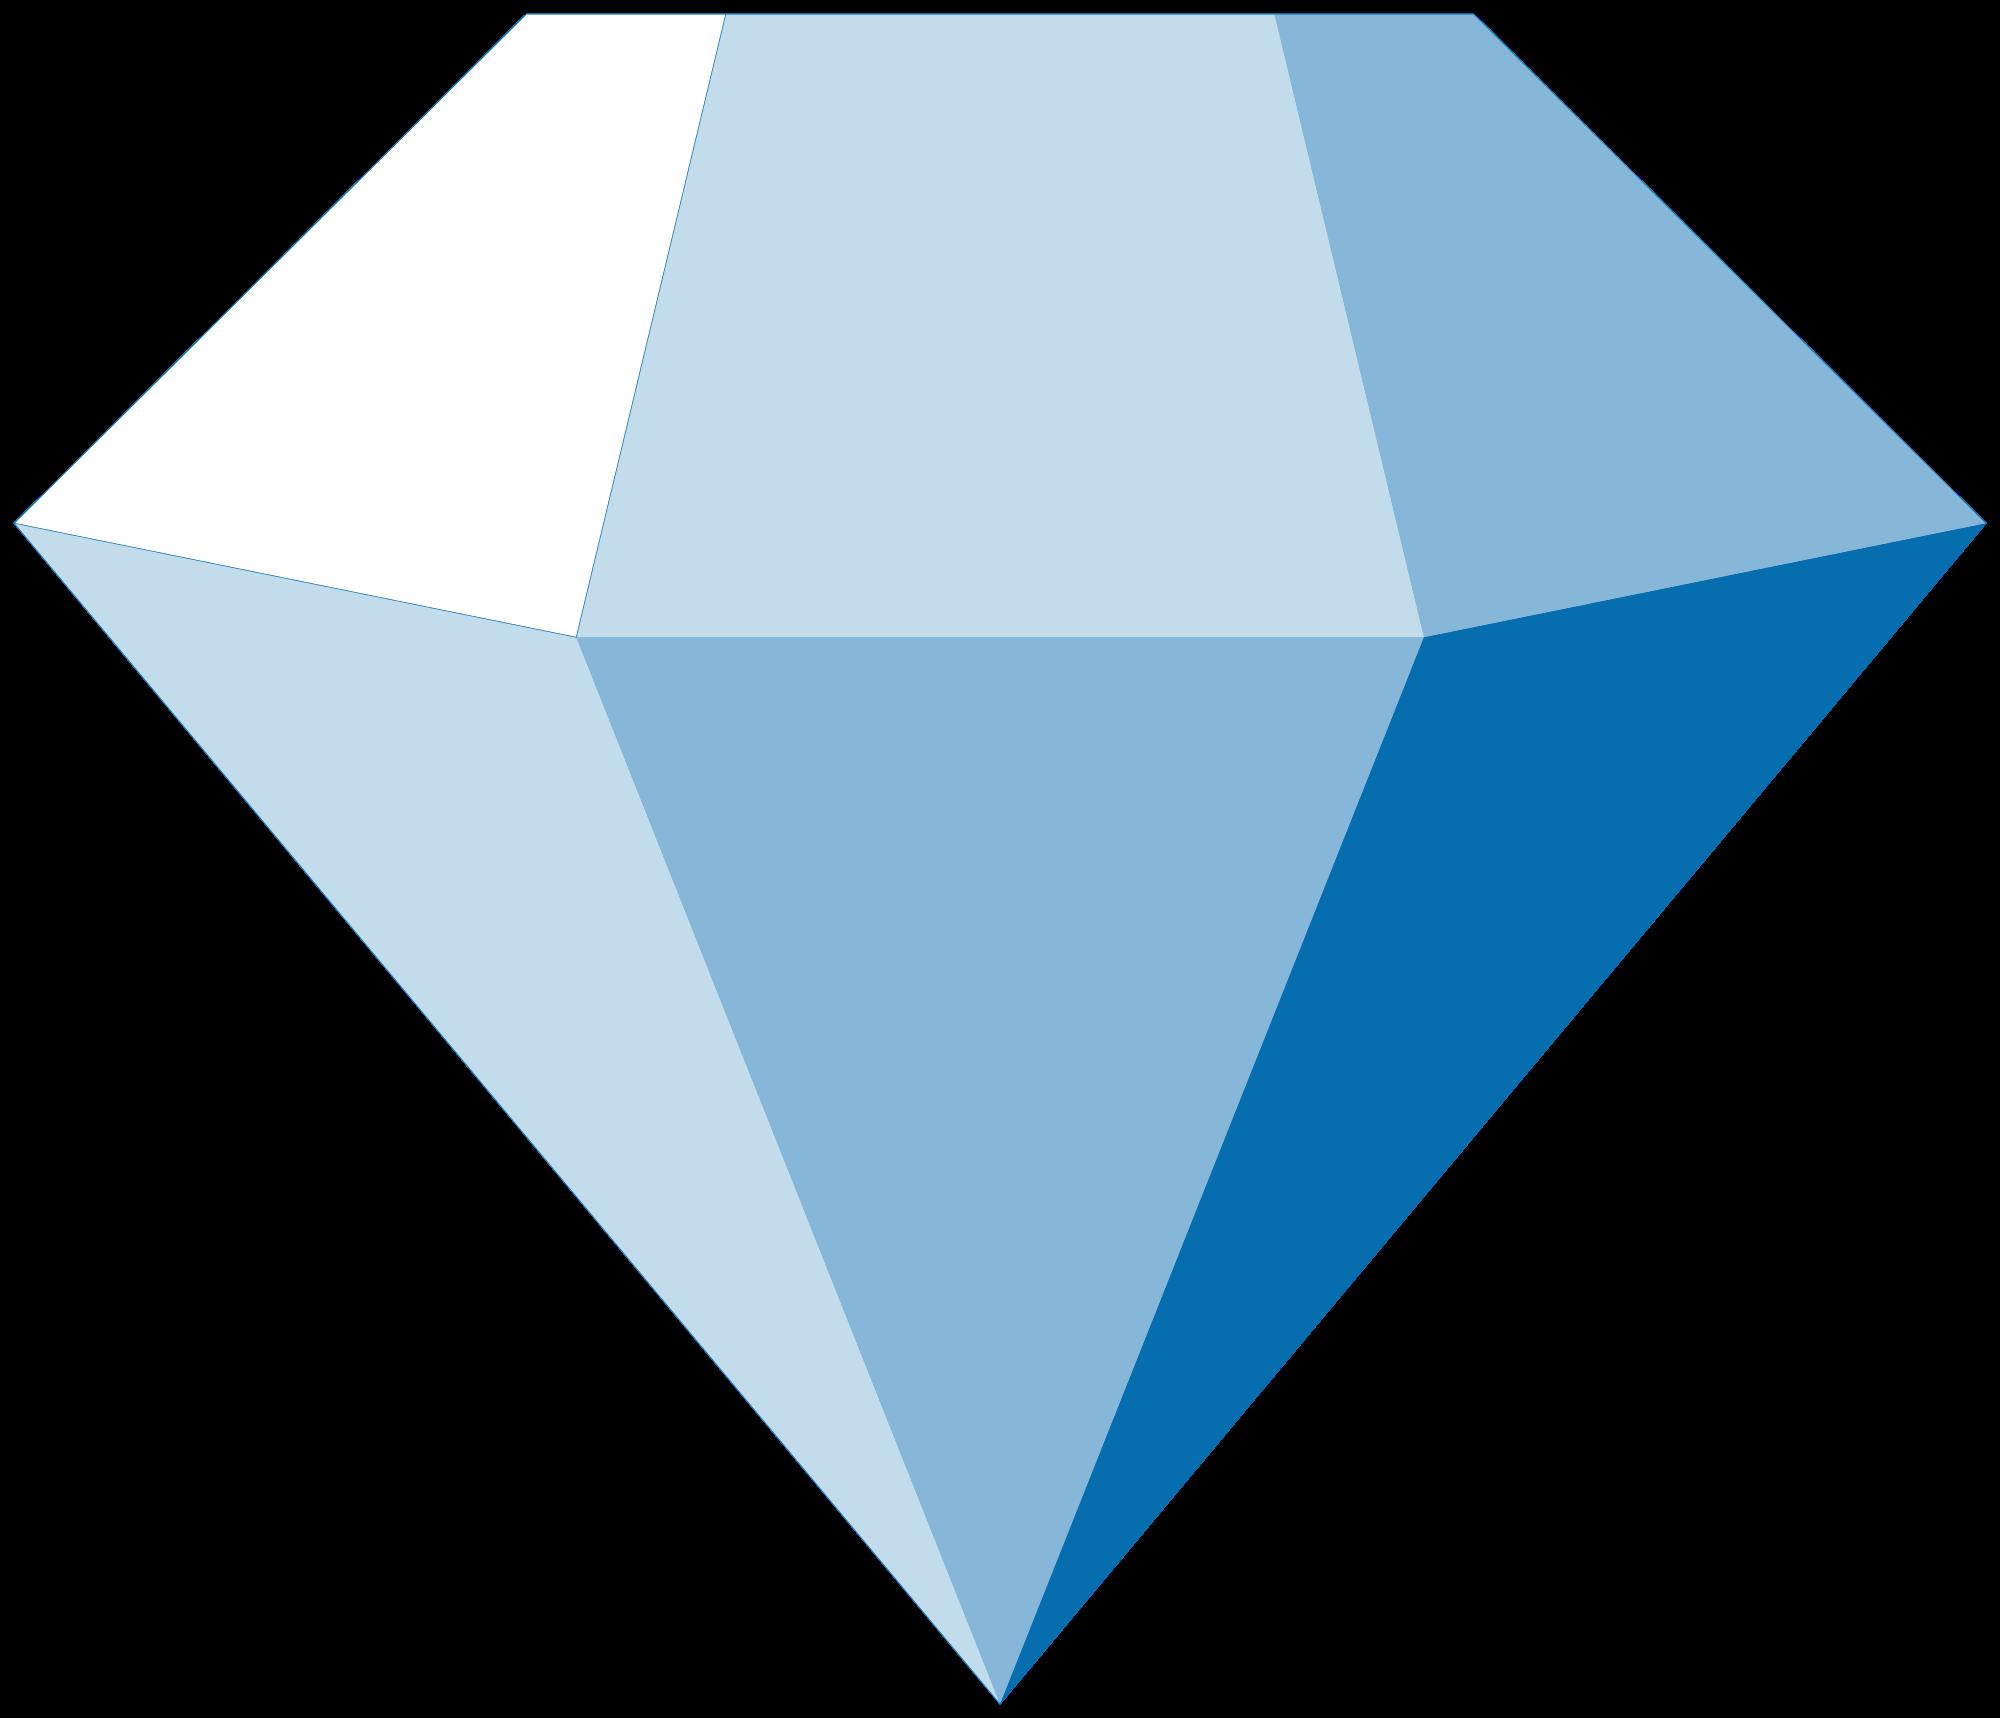 Diamond svg #4, Download drawings